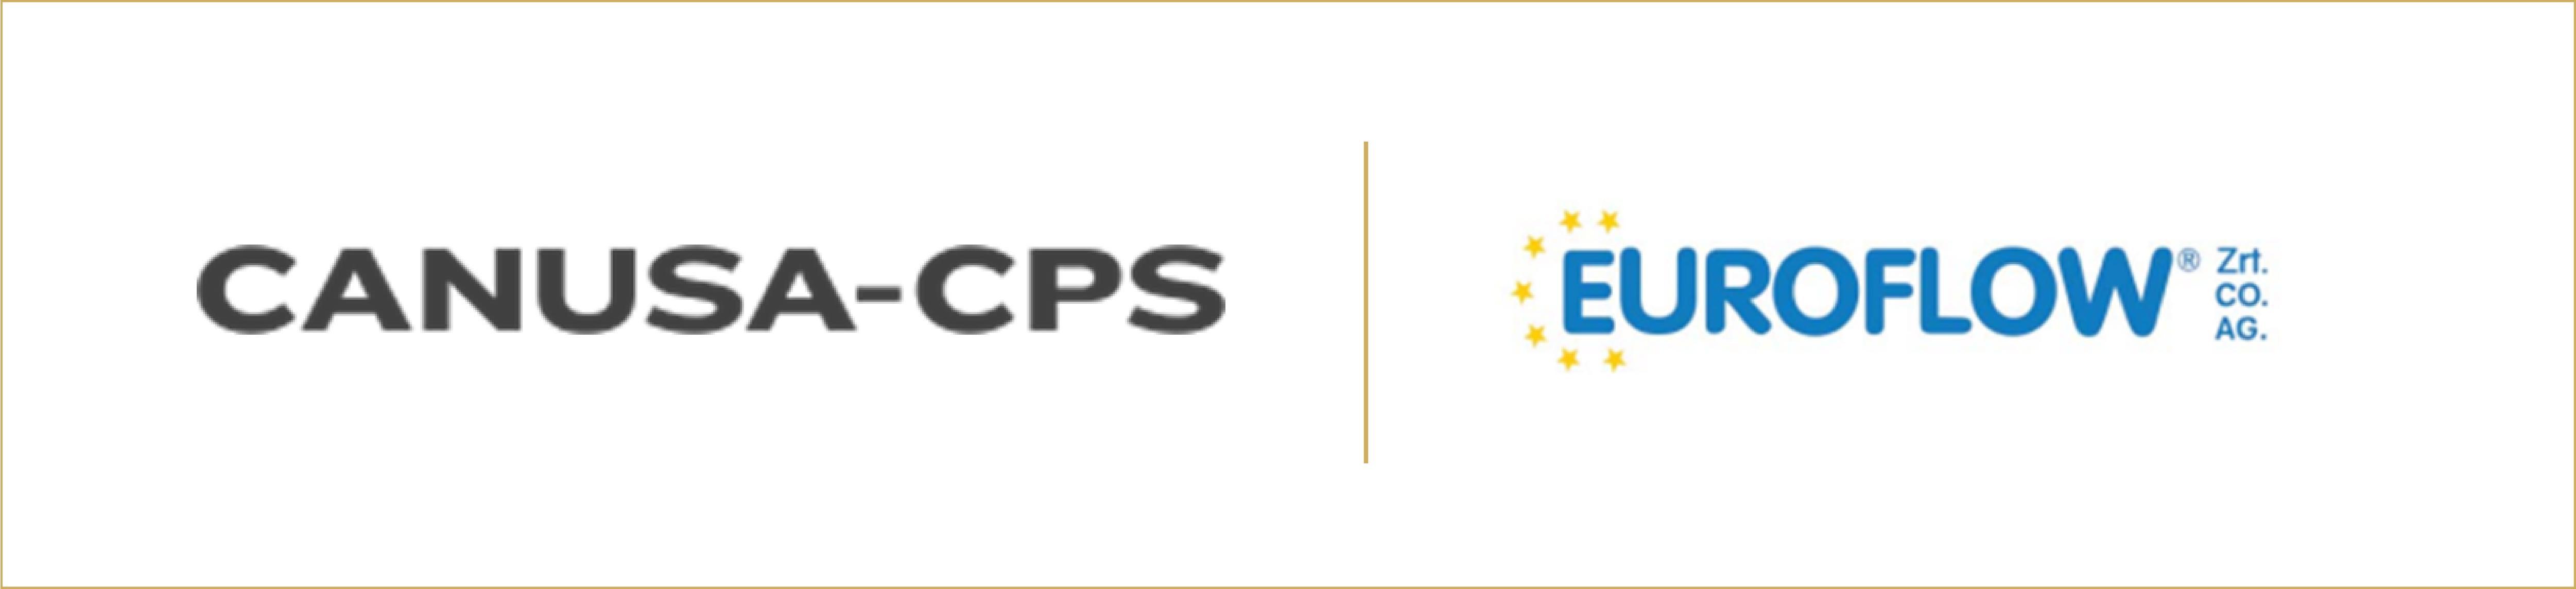 Euroflow_Canusa_PIP_logos